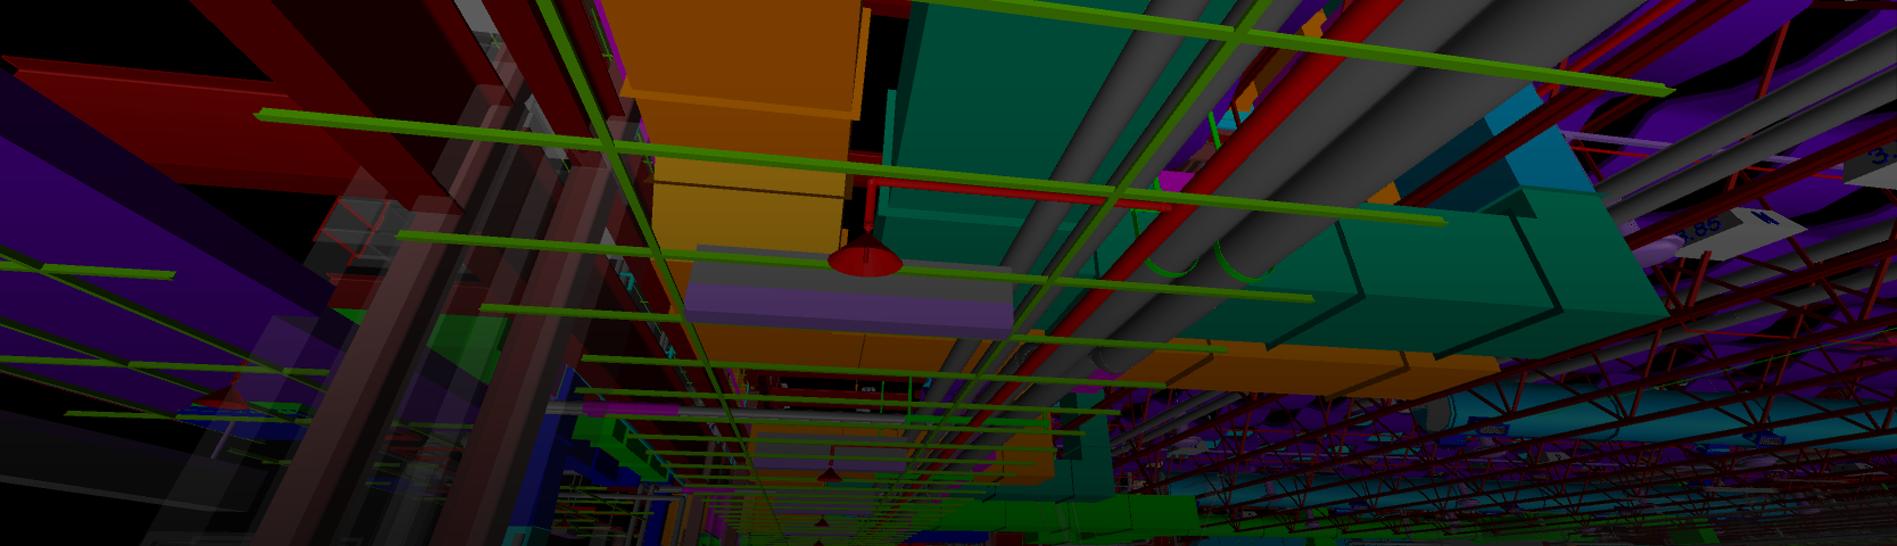 Ceiling grid BIM model